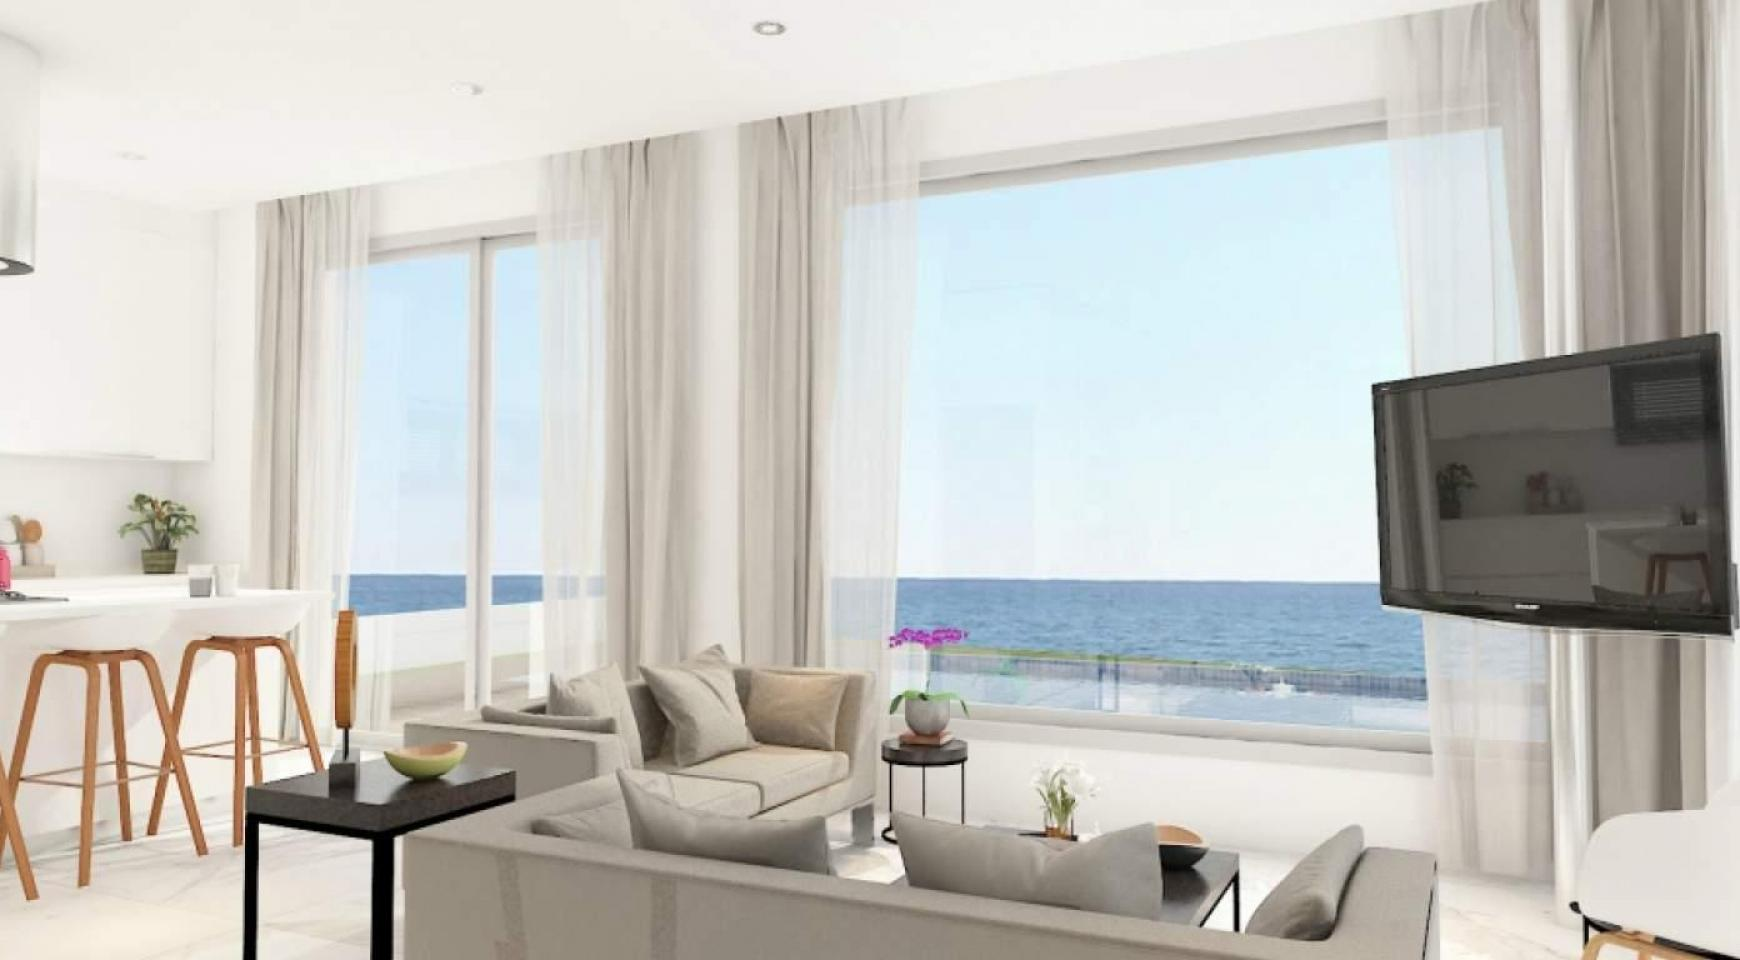 Contemporary Beachfront Villa with 5 Bedrooms - 11